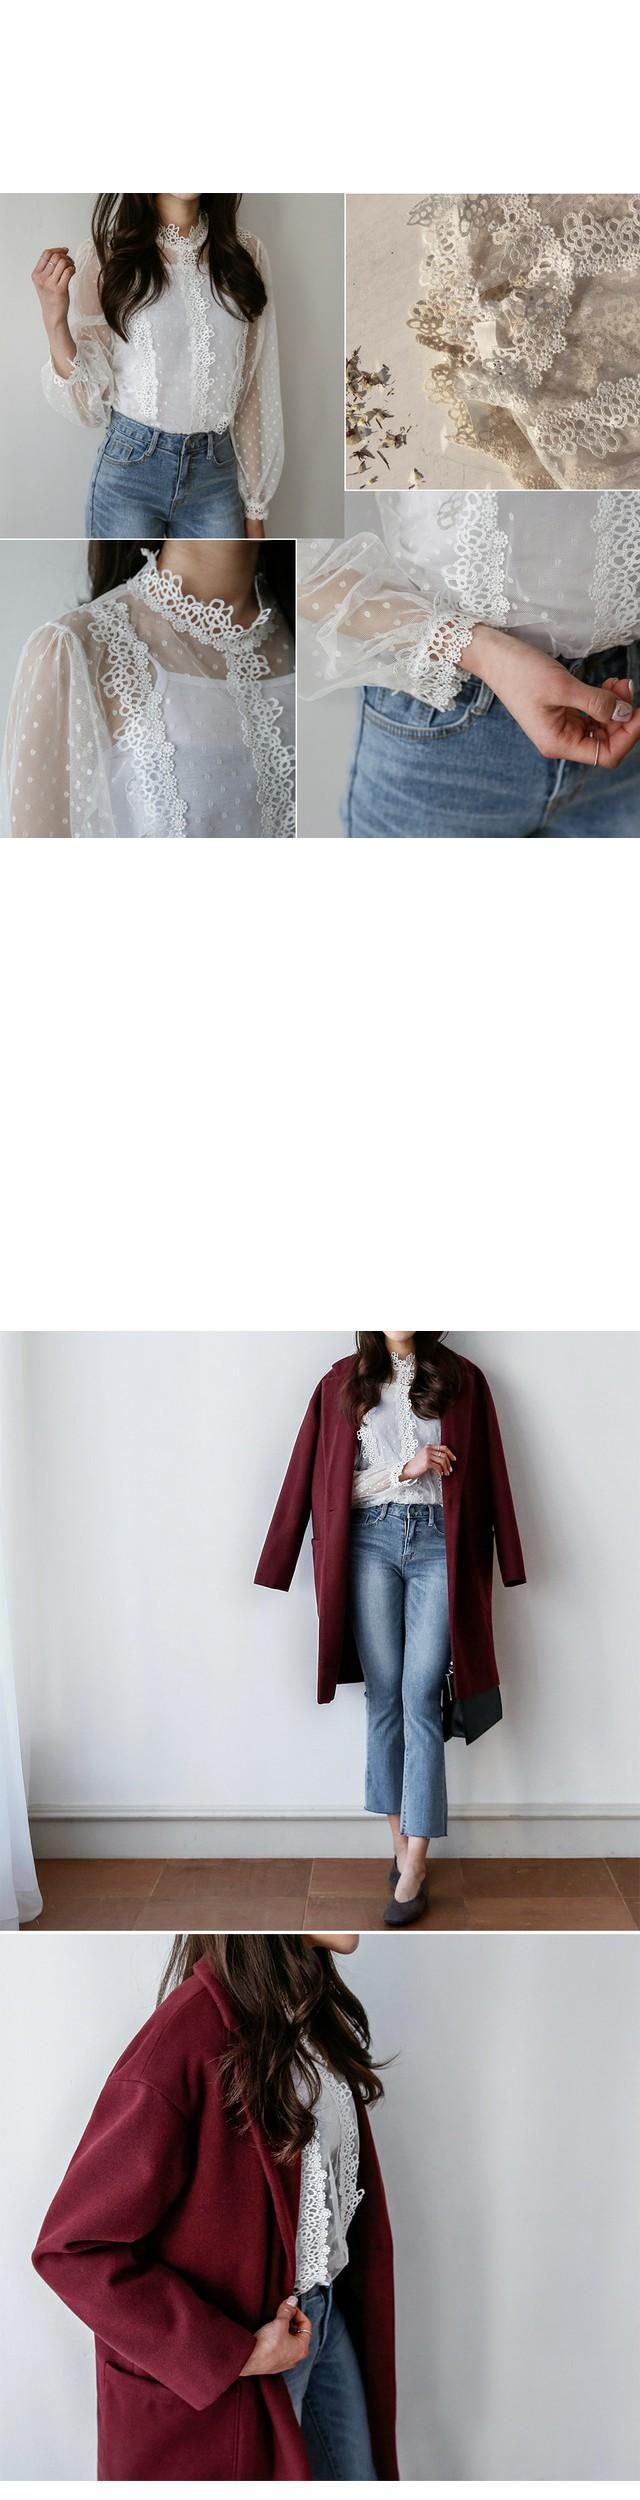 Romantio blouse